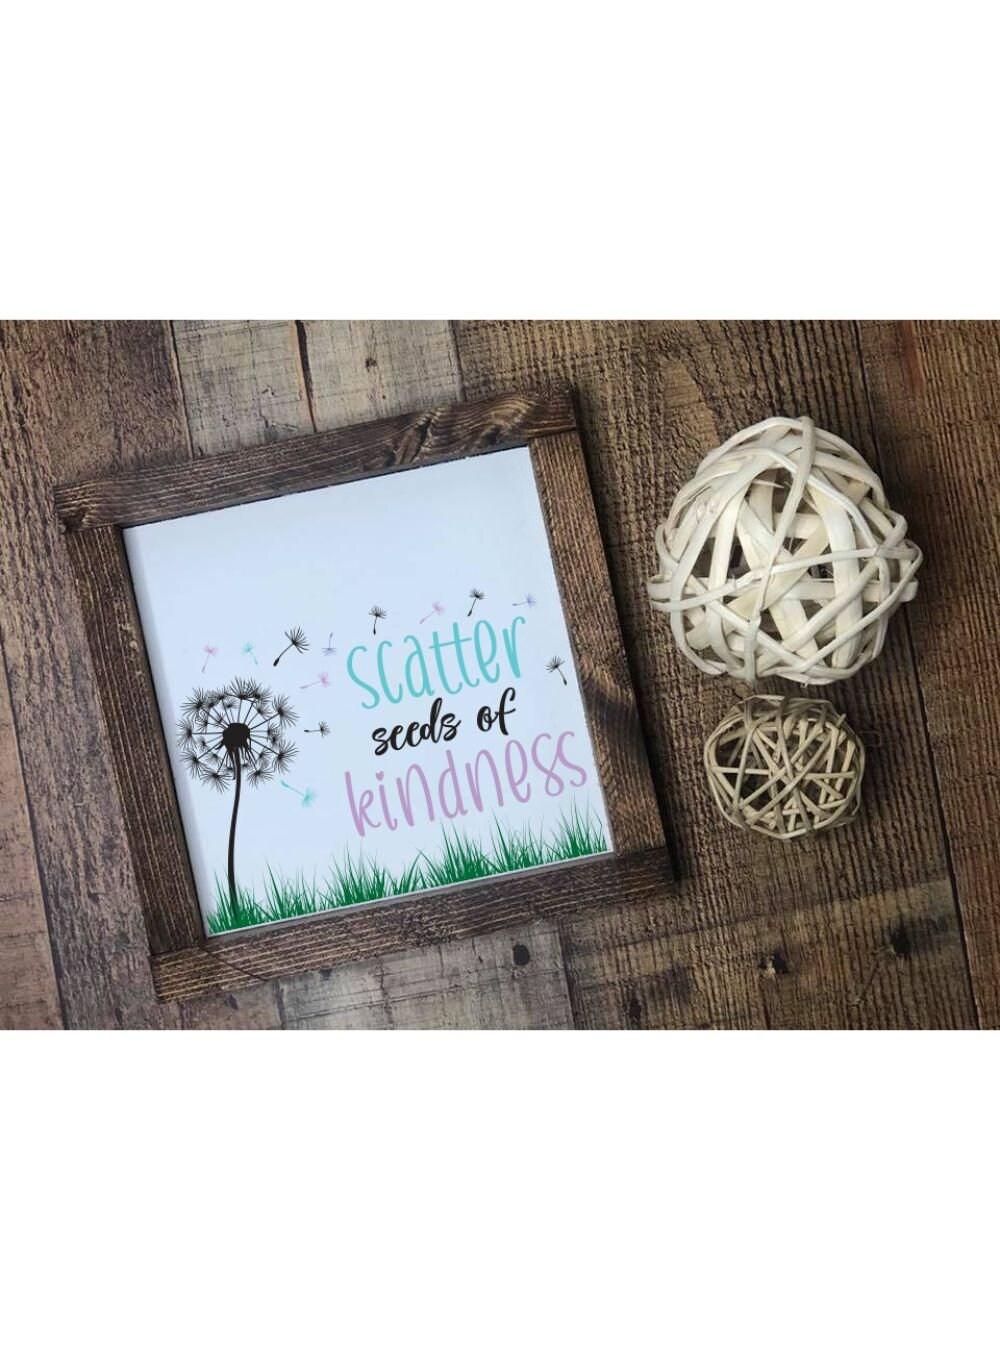 5x7-Scatter Seeds of Kindness-Magnolia Design Co Reusable Stencil